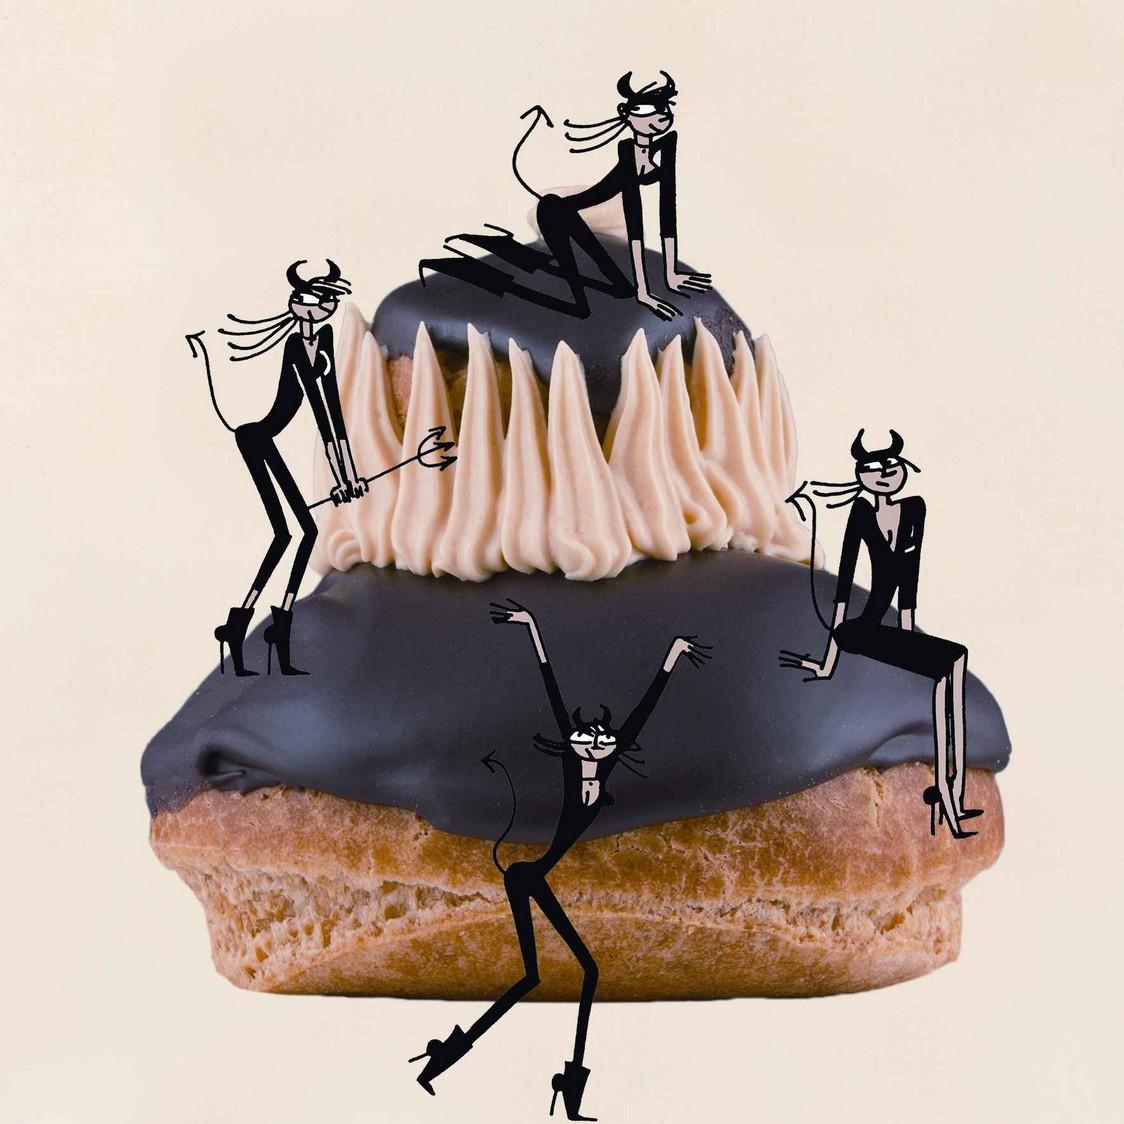 Religieuse Psycho du gâteau - copie